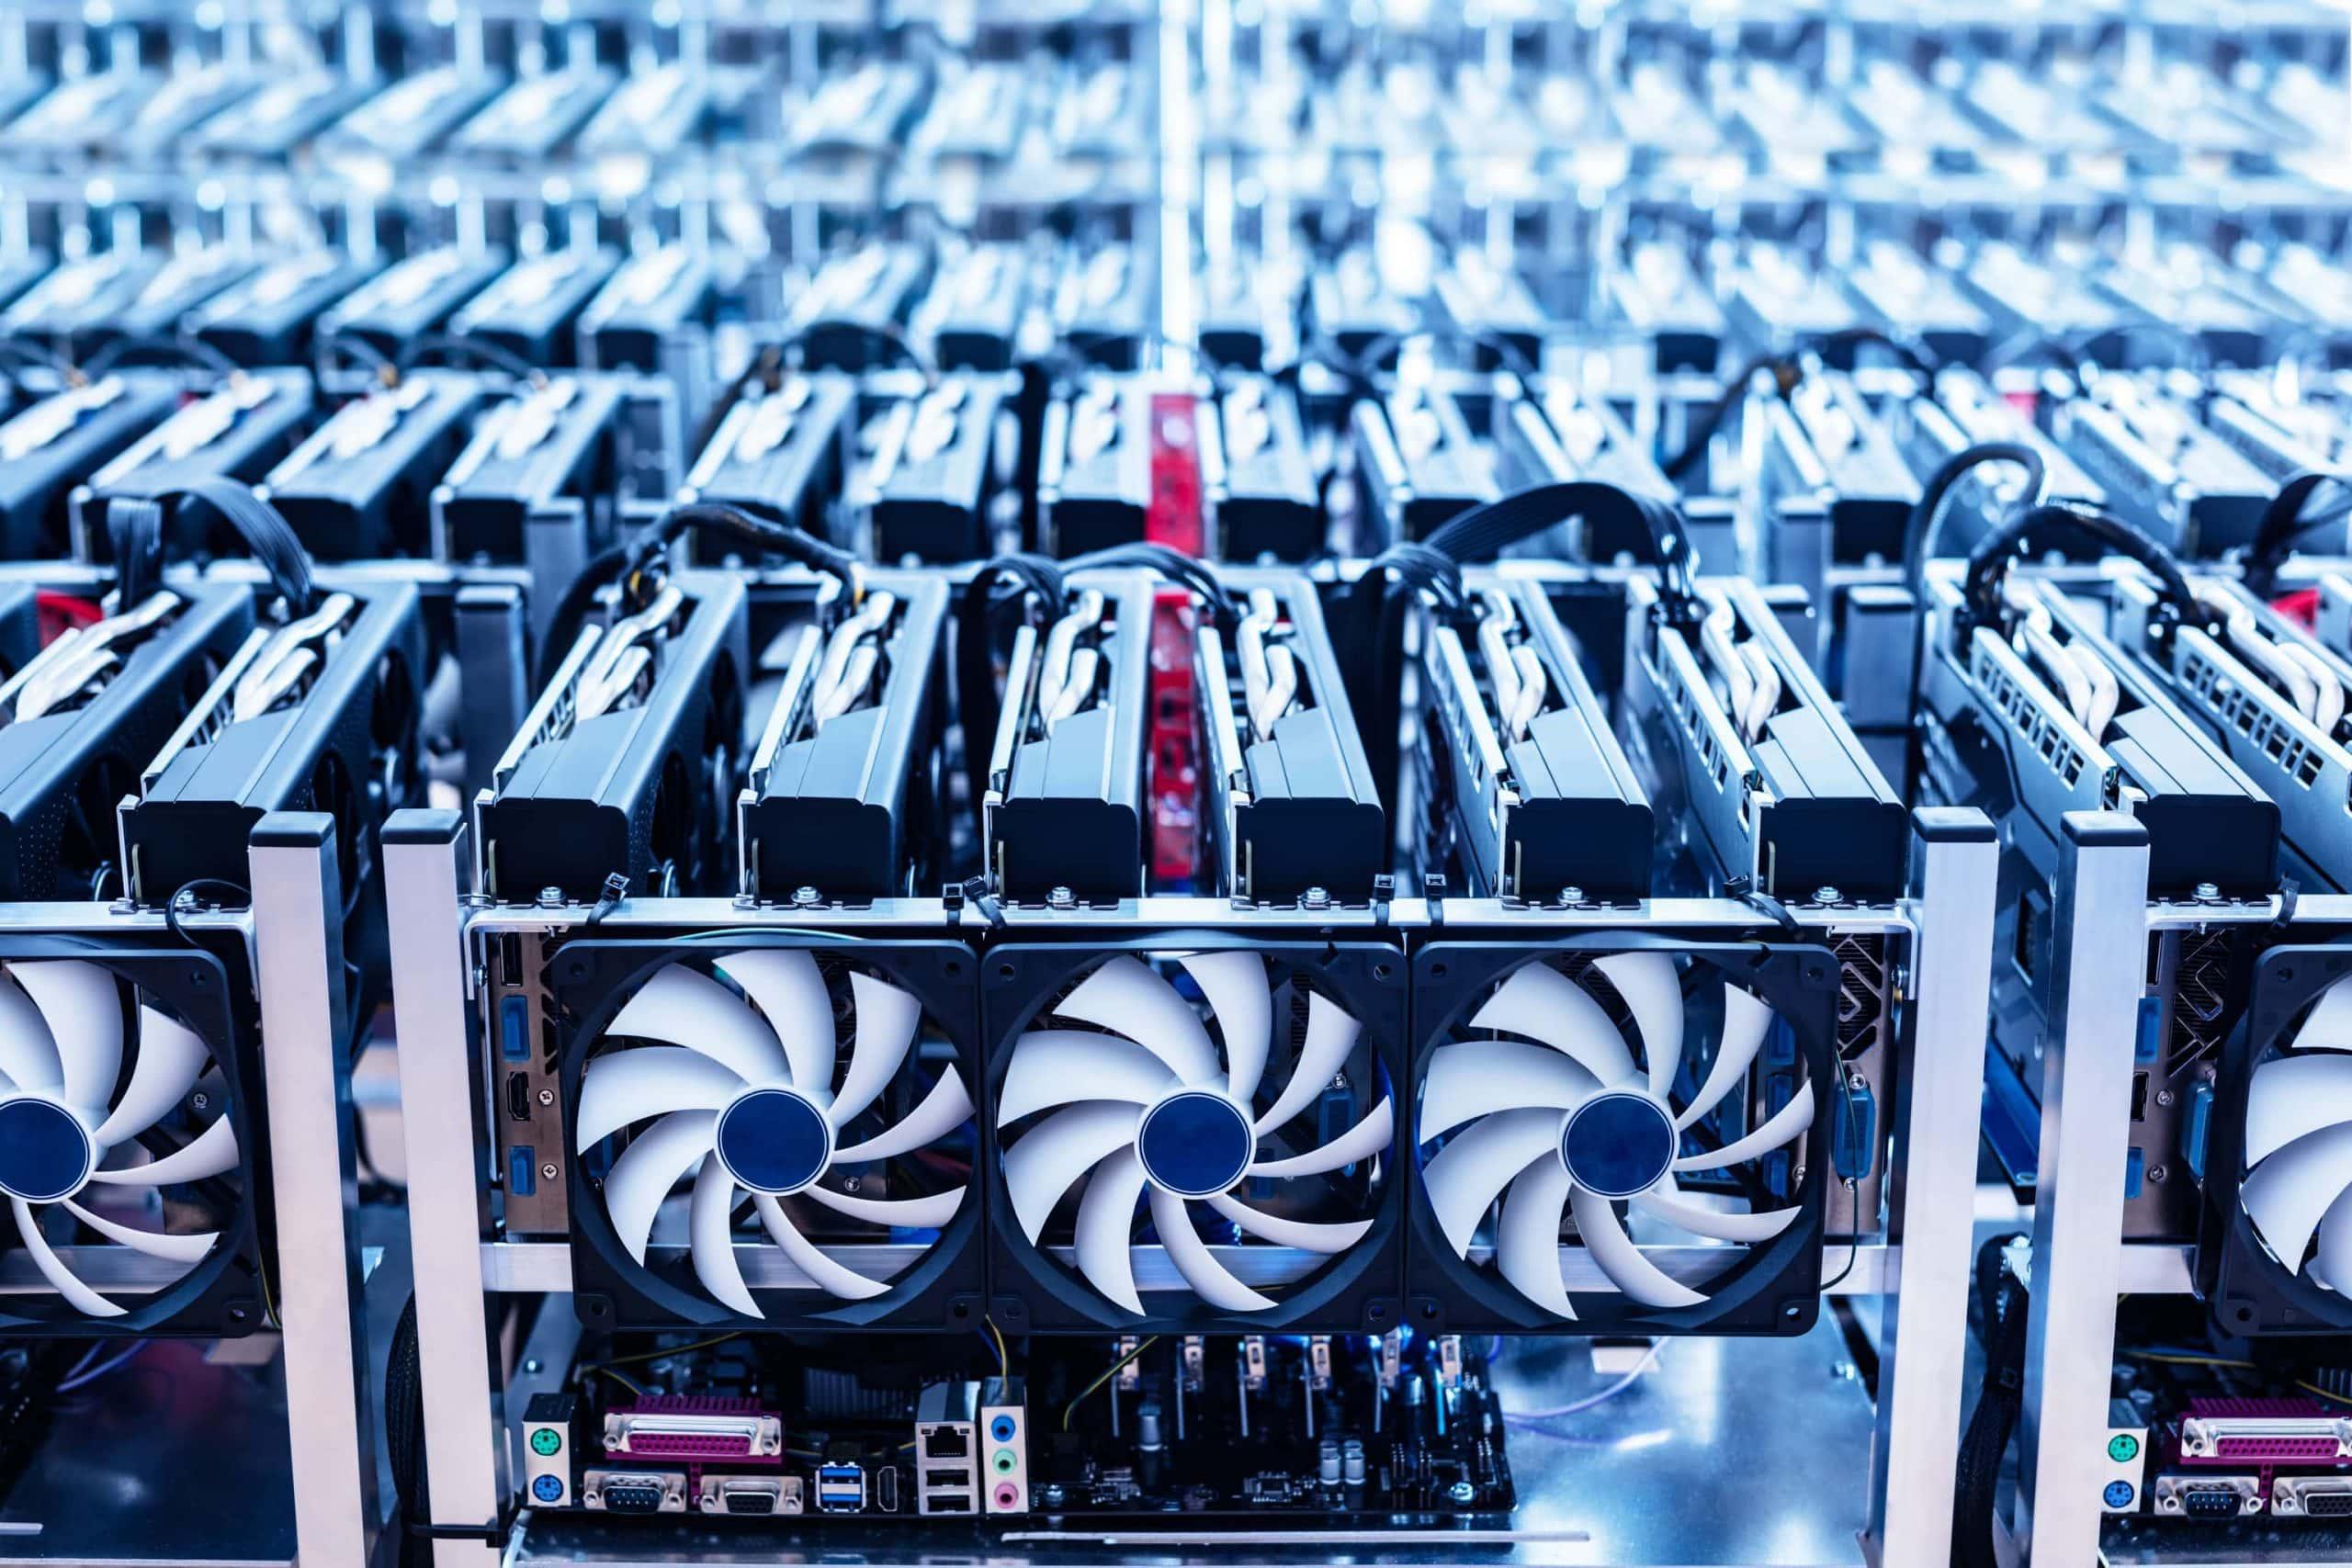 Bitcoin Mining Maschine blau